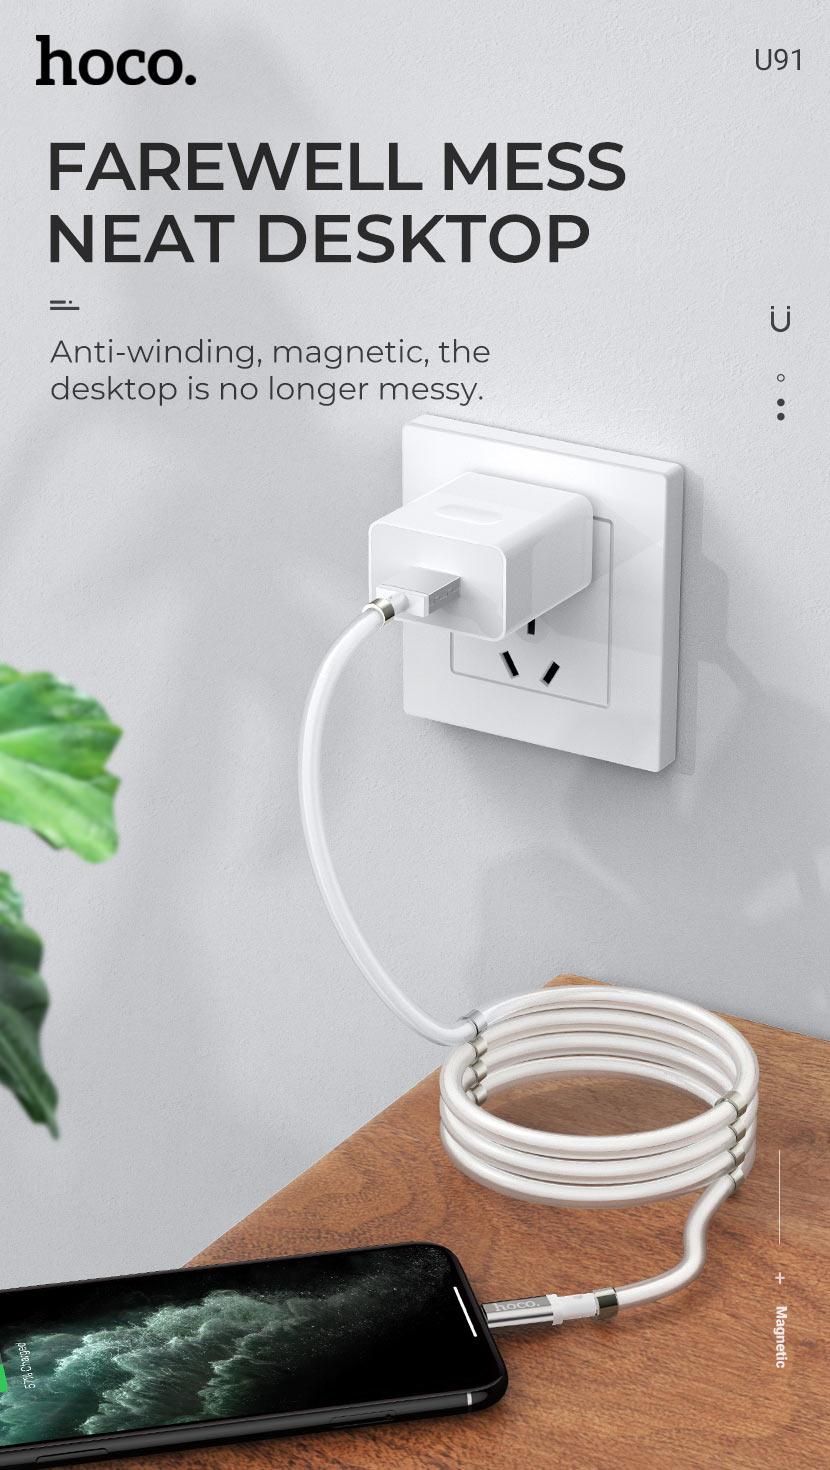 hoco news u91 magic magnetic charging cable anti winding en